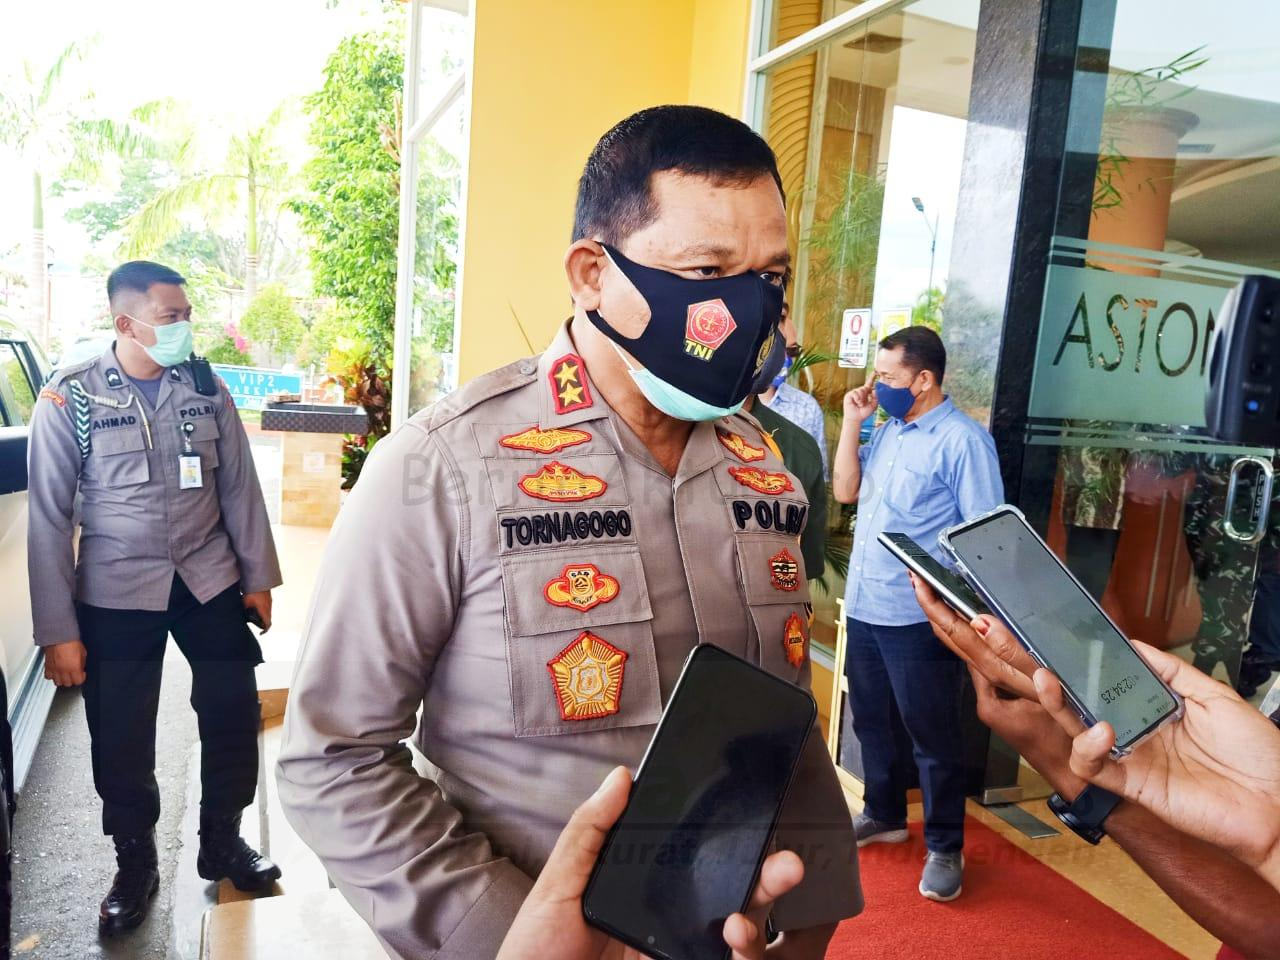 Kapolda PB: Warga Yang Tidak Pakai Masker Dapat Sanksi Baca Pancasila 17 IMG 20200926 WA0032